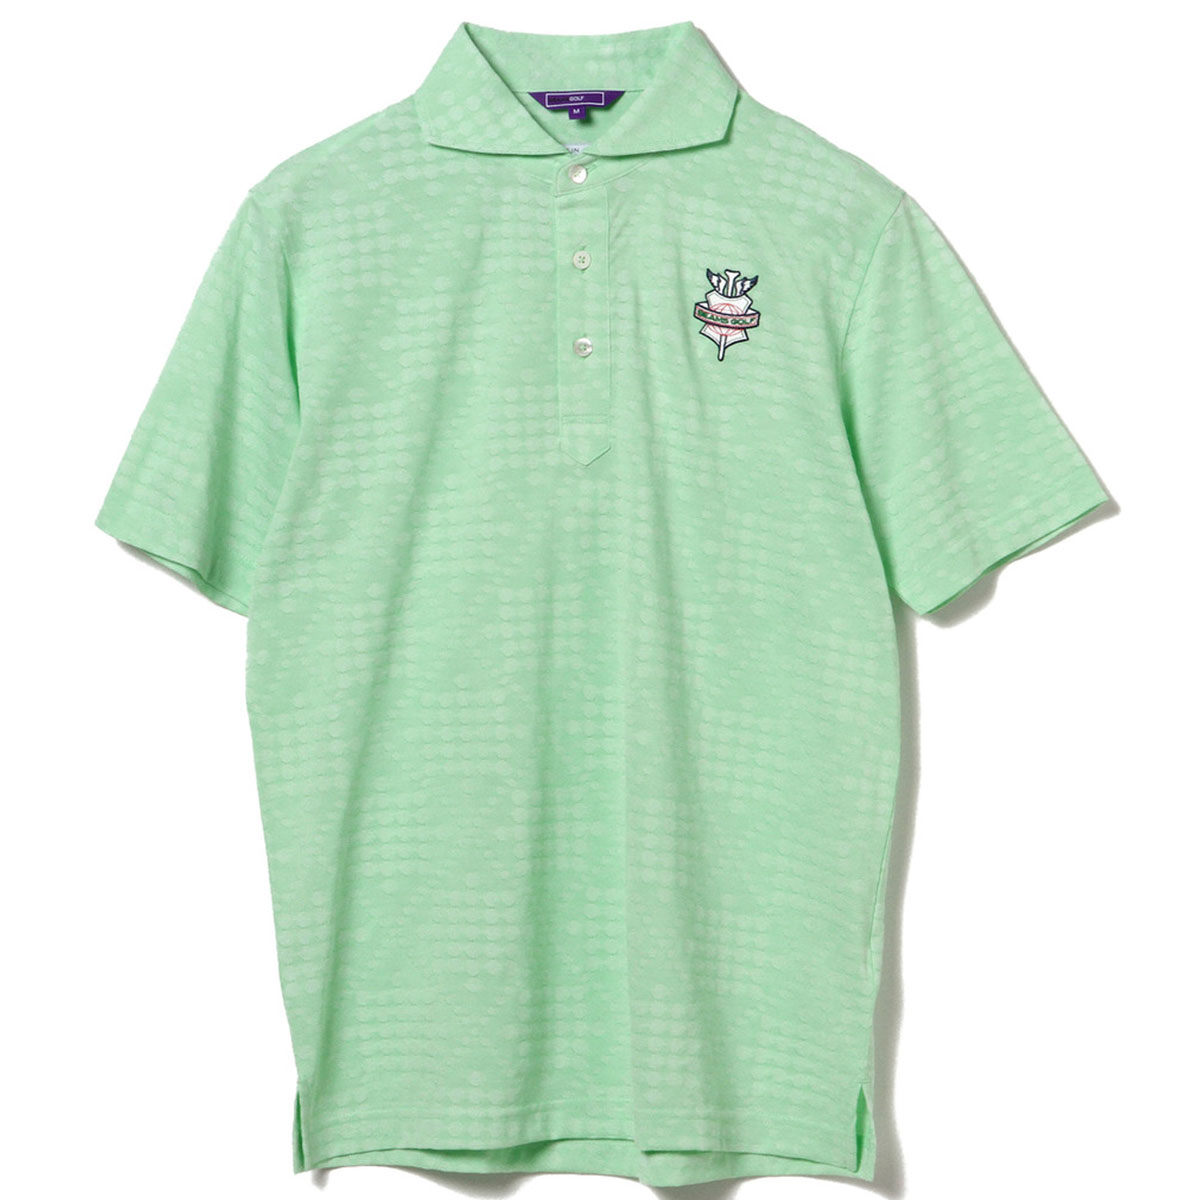 BEAMS GOLF PURPLE LABEL シャンブレー ドット ポロシャツ